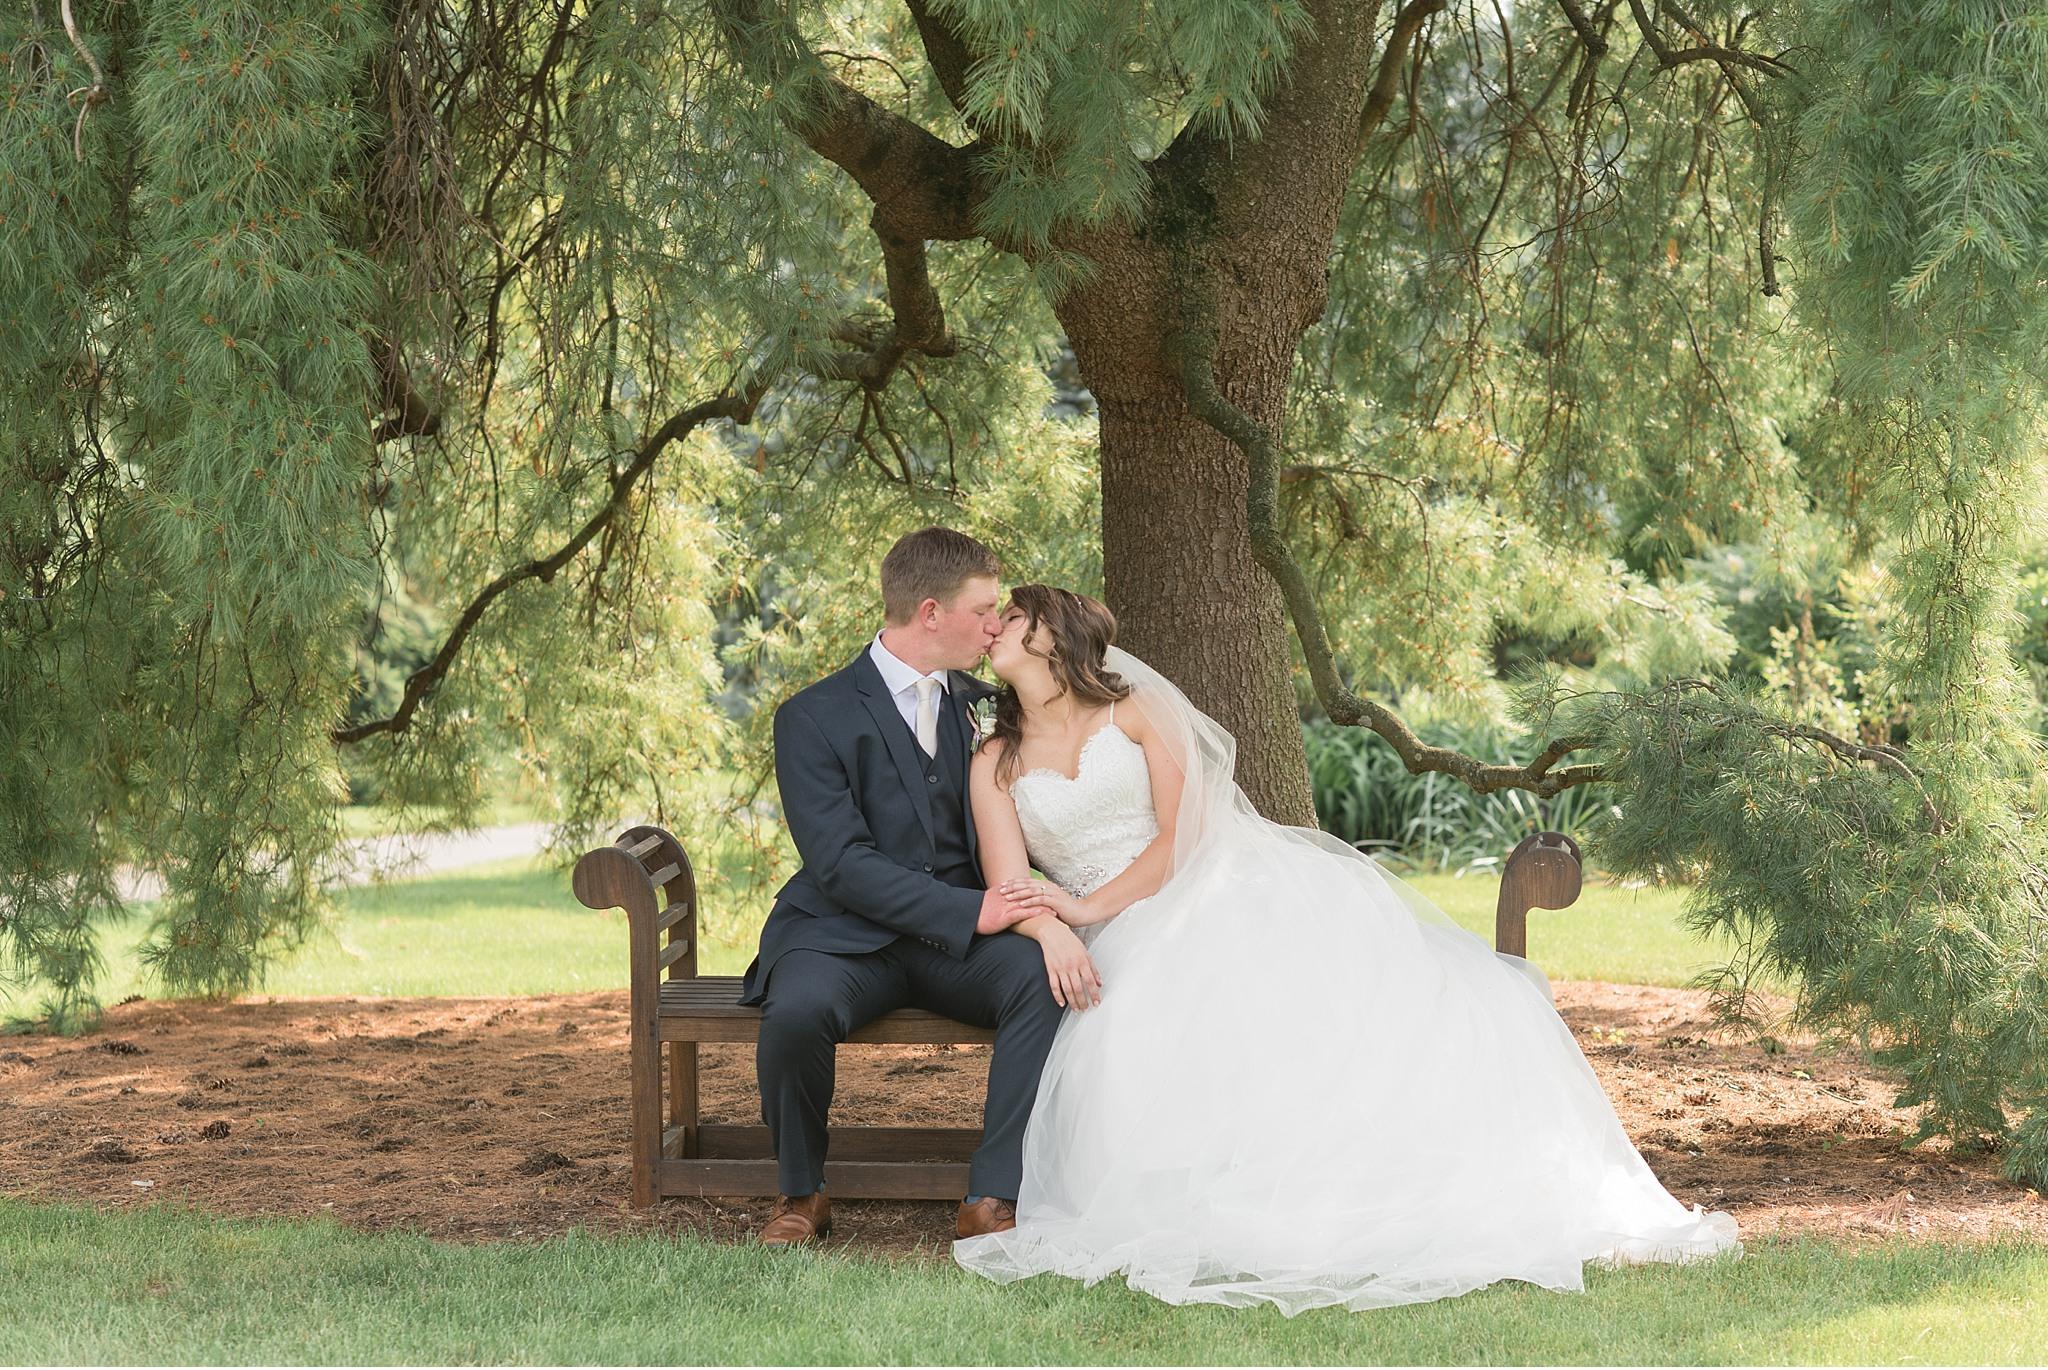 Bride and Groom Hershey Gardens Hershey Country Club Summer beautiful wedding photography_1595.jpg